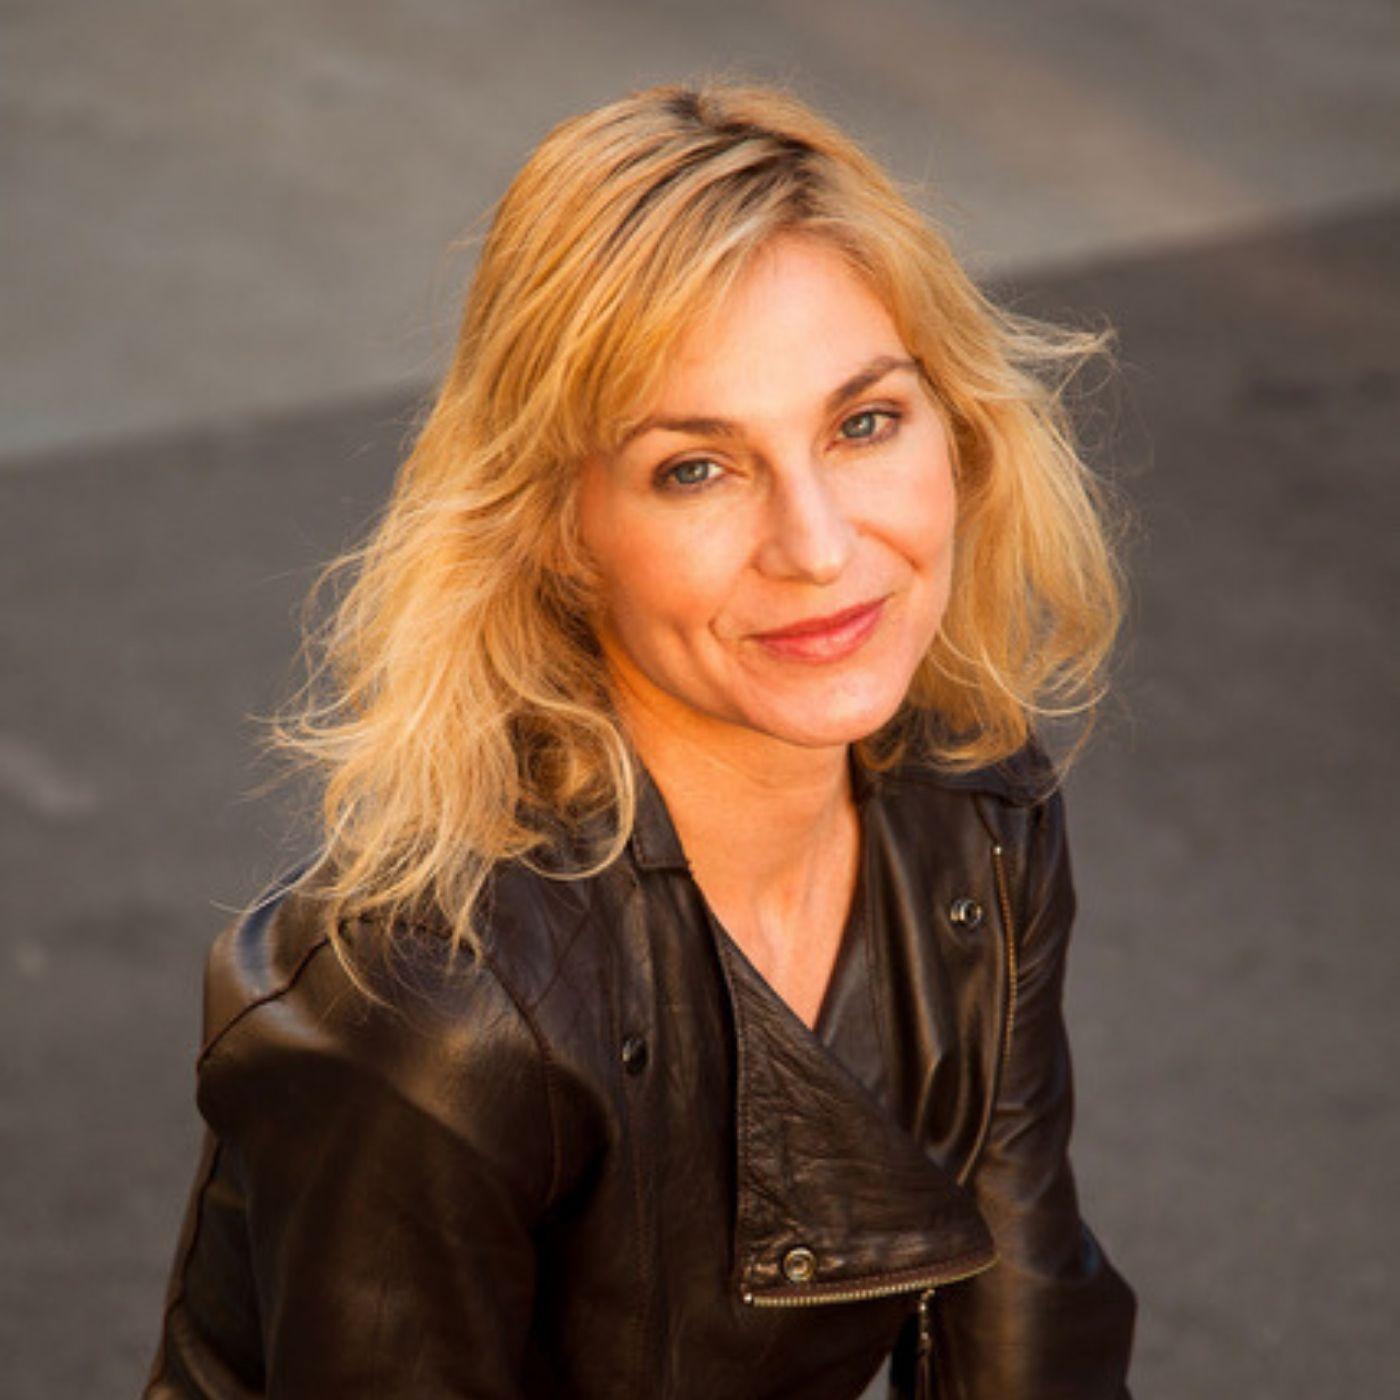 Jennifer Kroot Filmmaker